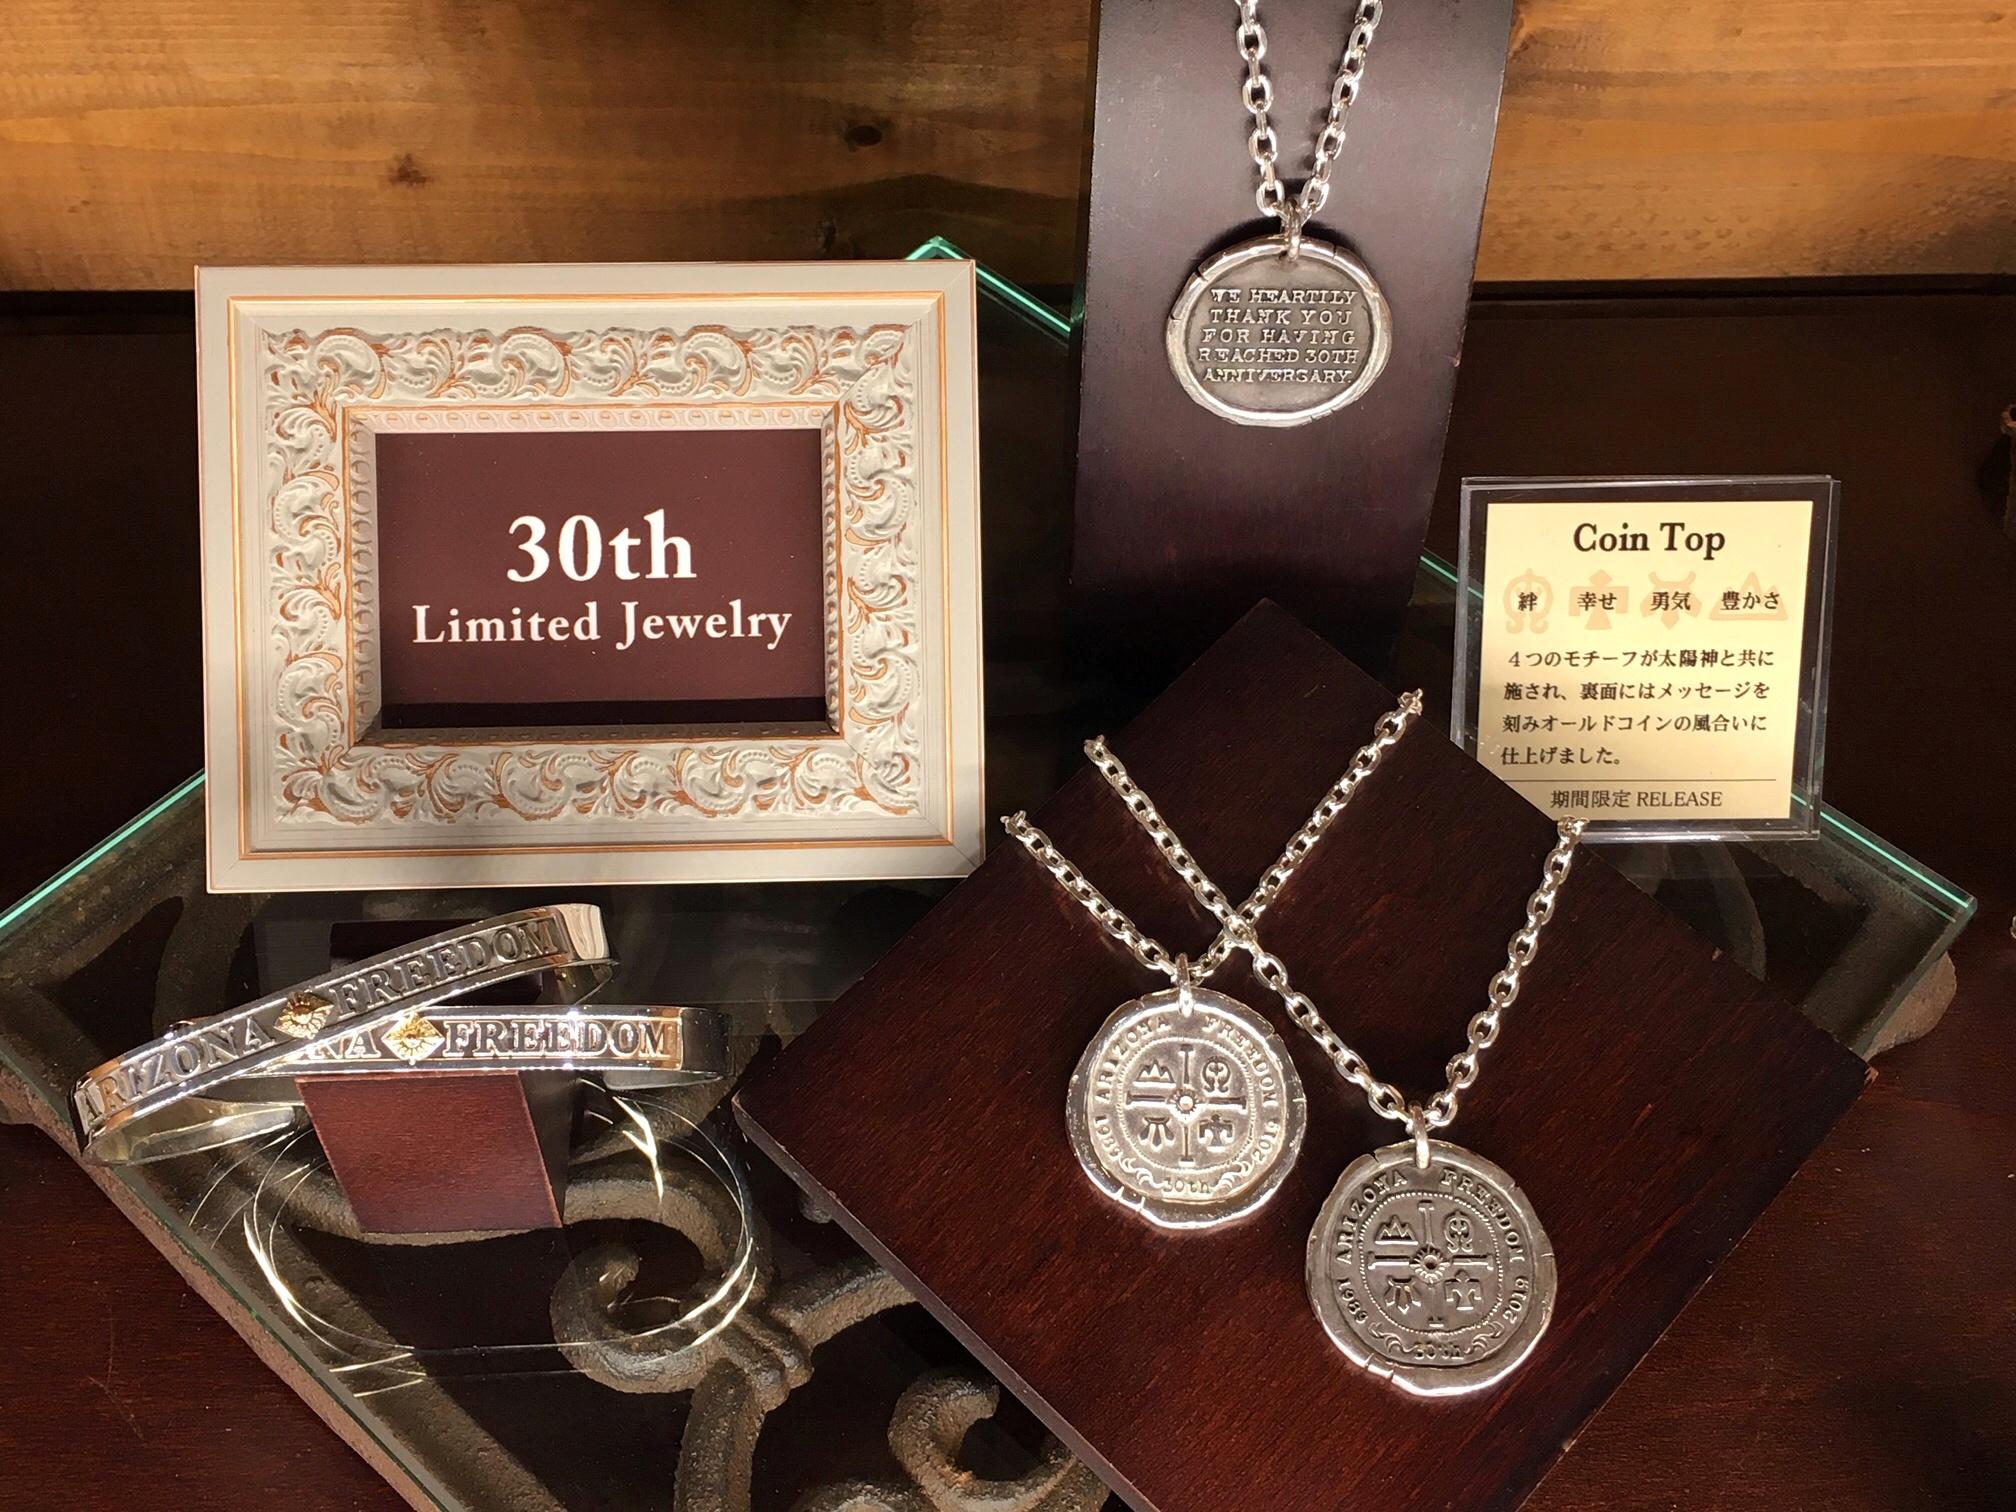 30th Anniversary limited item